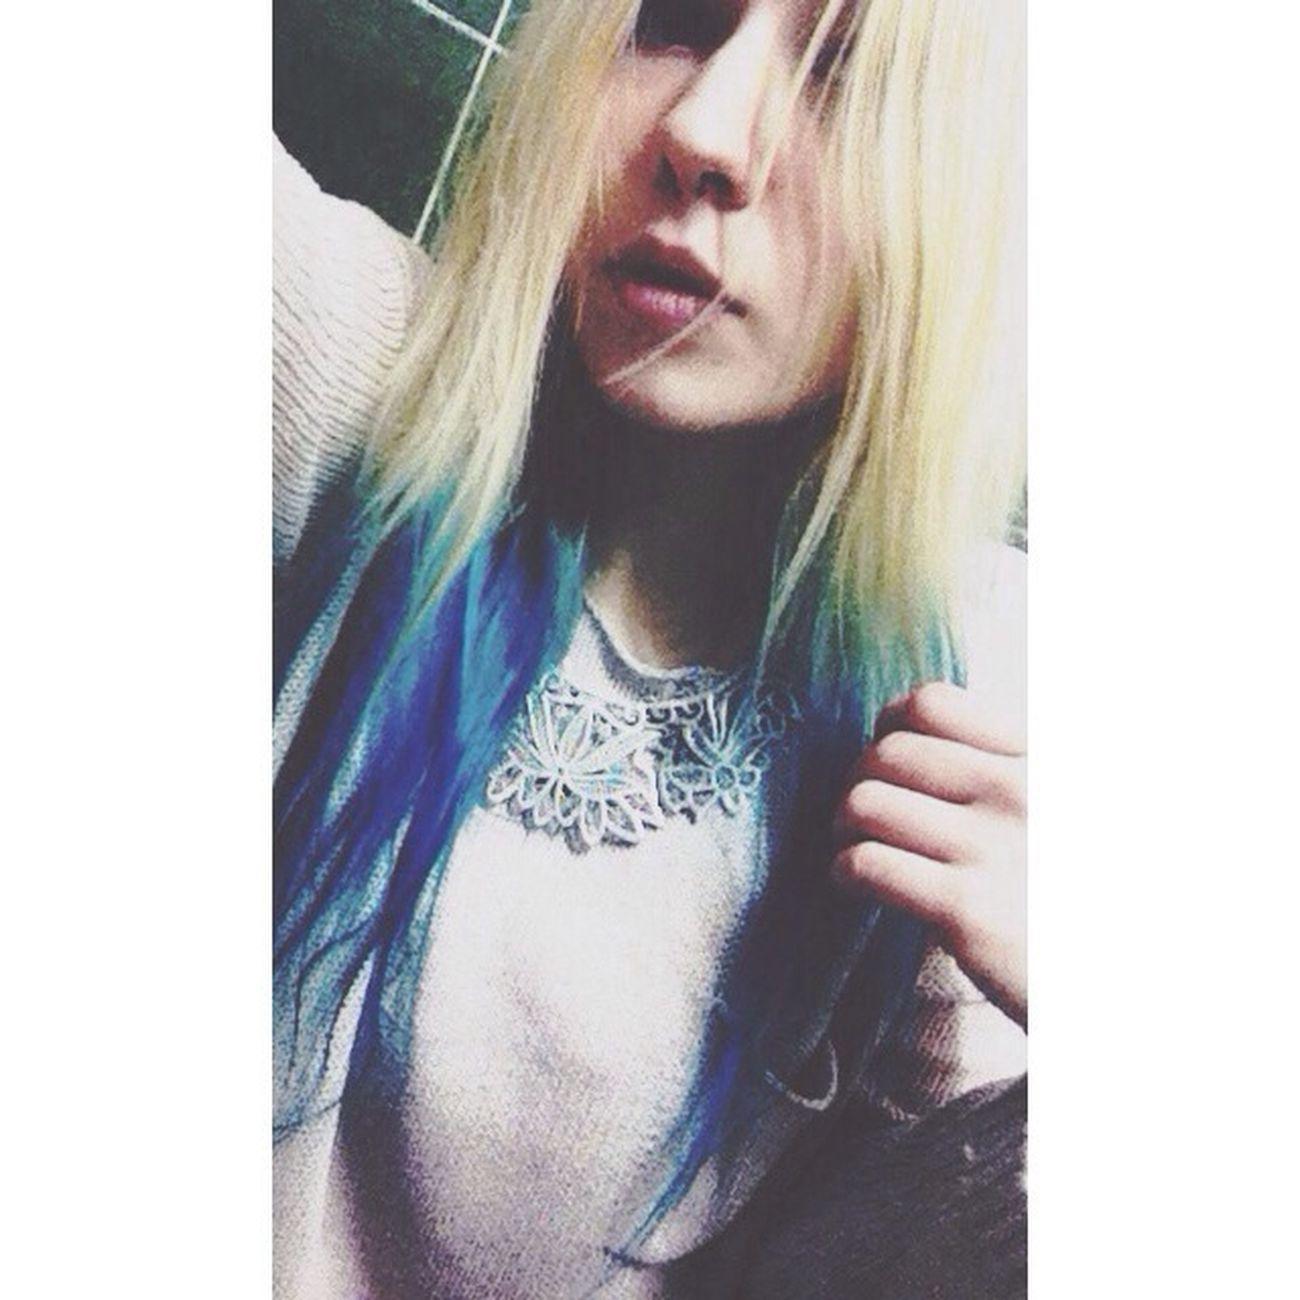 Dip Dye Hair Hairstyle Blue Hair Selfportrait